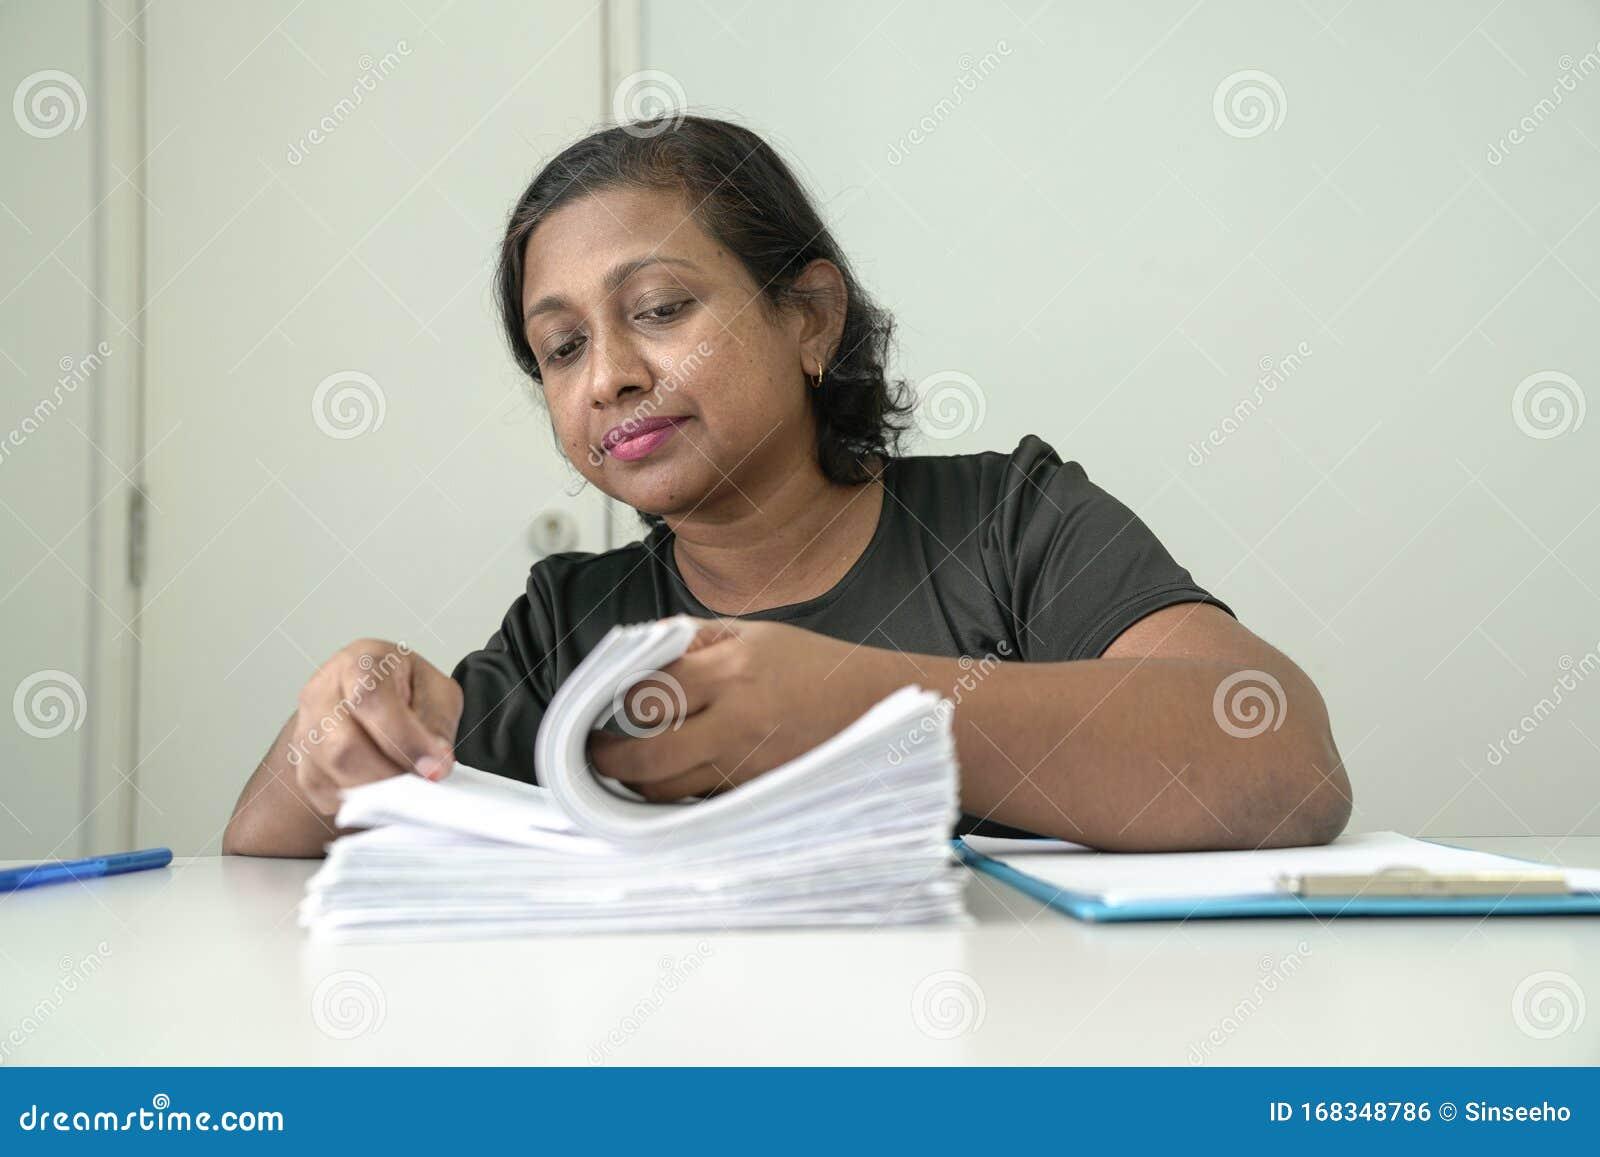 Write analysis part dissertation